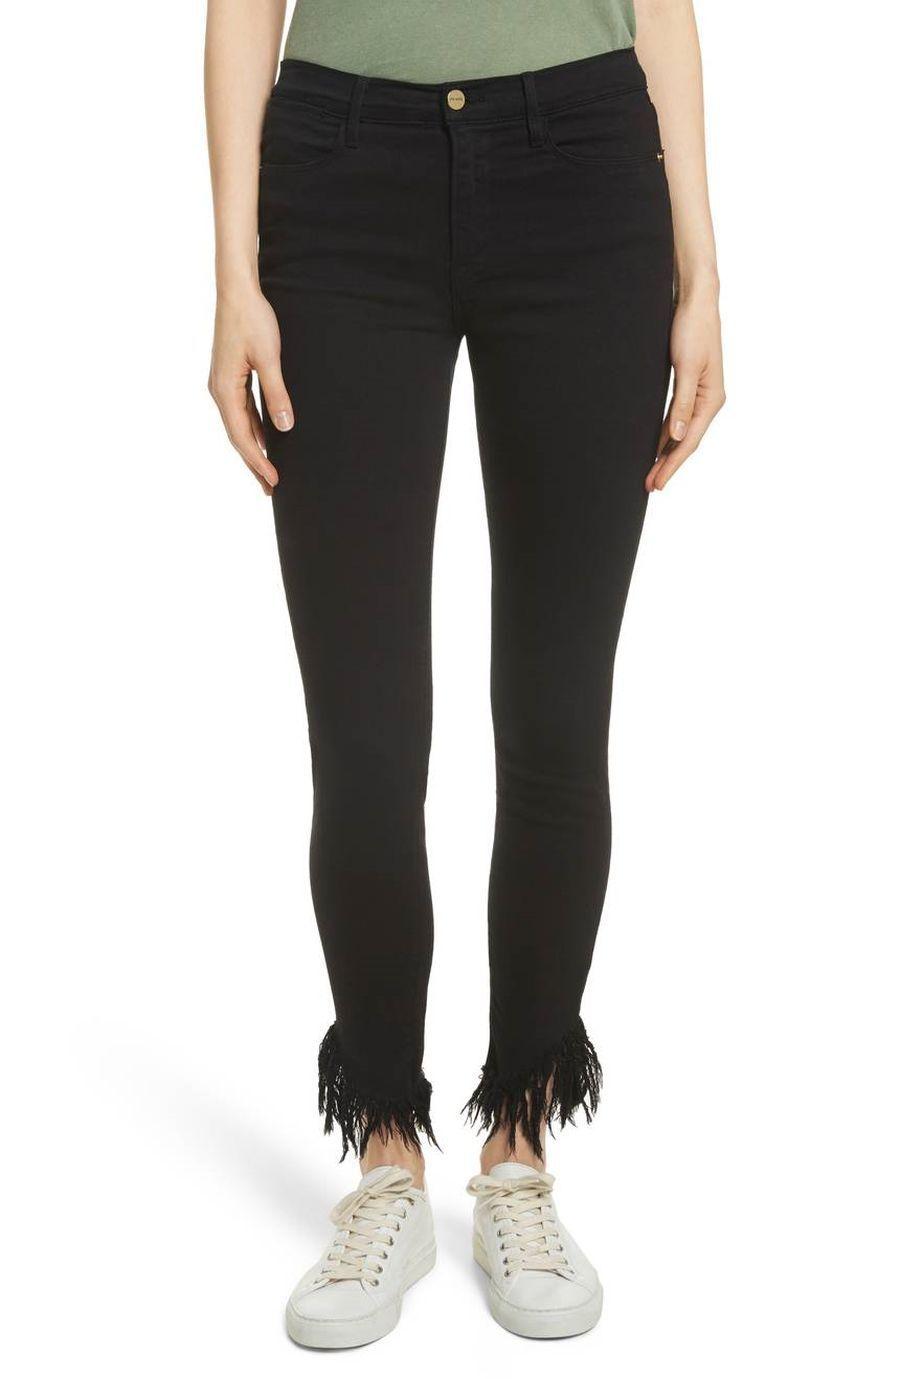 Frame Denim Le High Shredded Skinny Jean - black Size 25   0